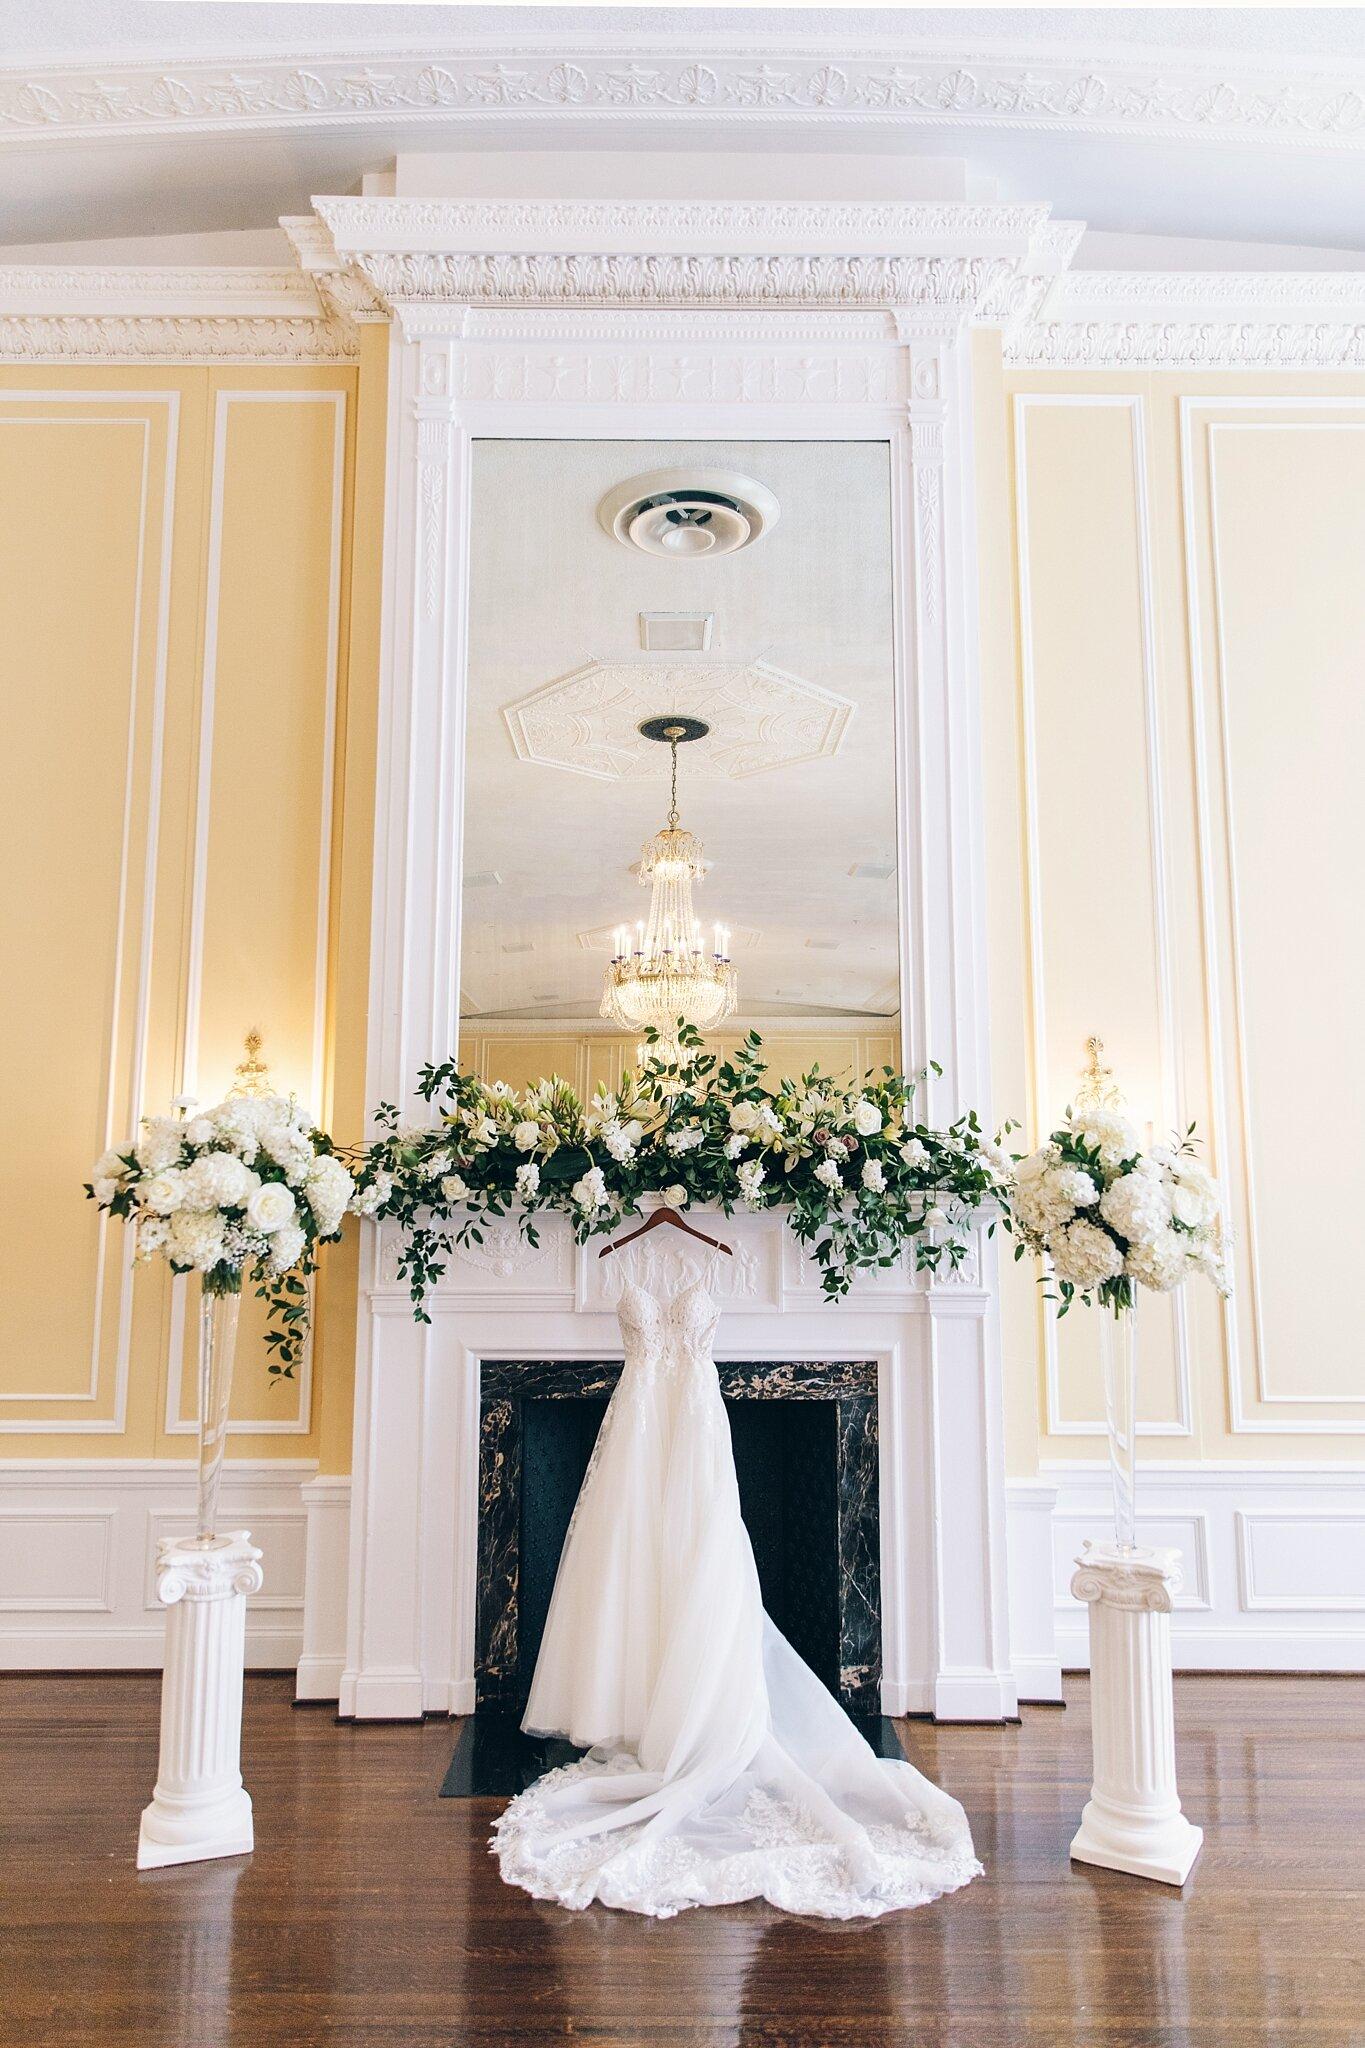 patrick-henry-ballroom-wedding-roanoke_0468.jpg